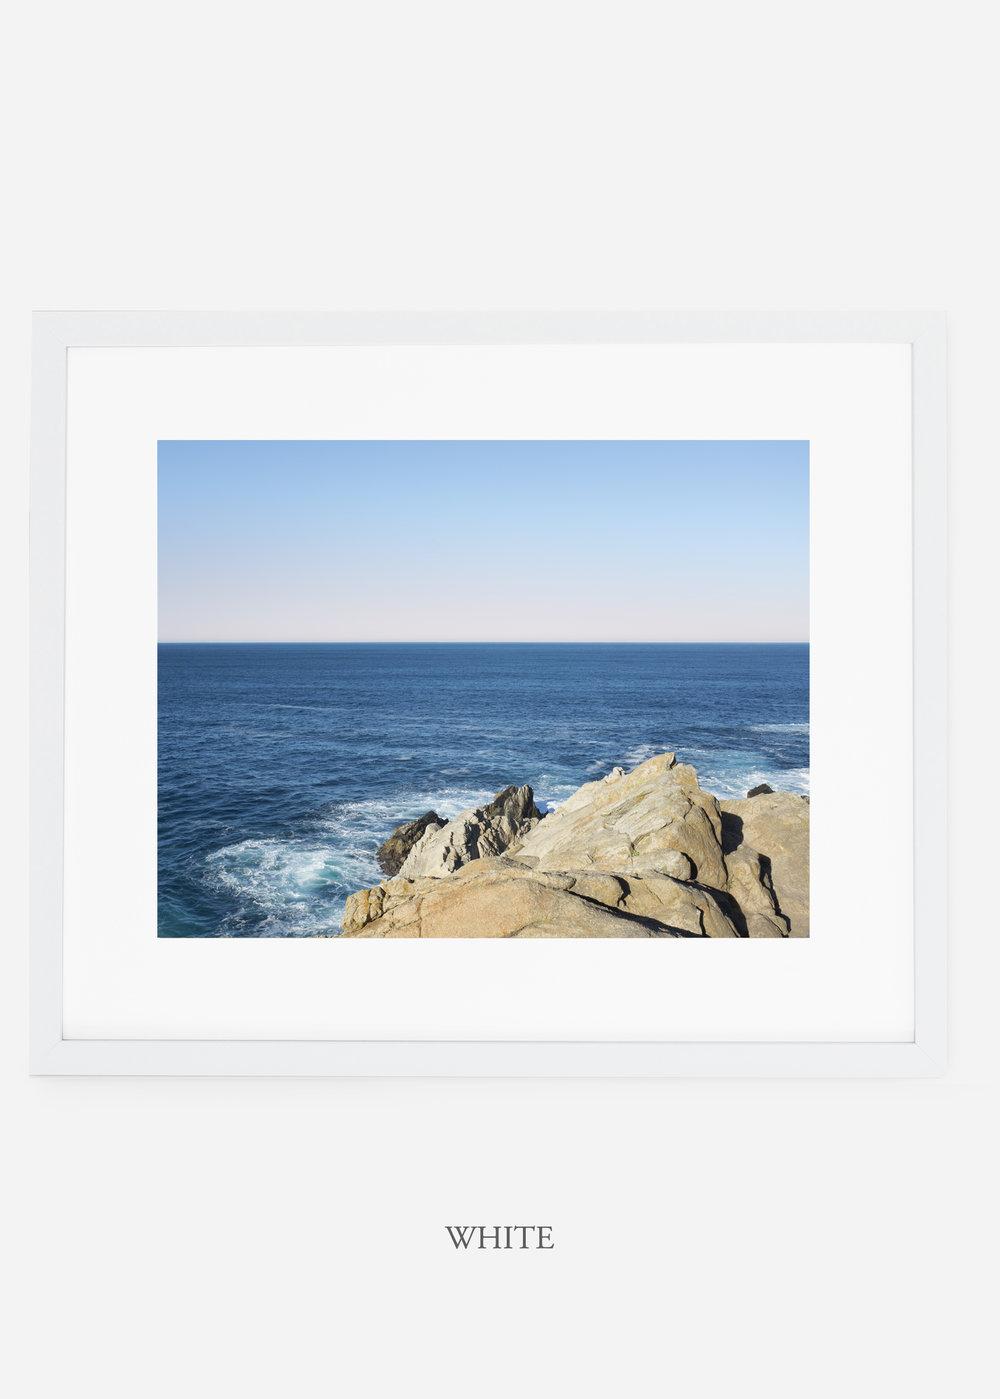 WilderCalifornia_whiteframe_interiordesign_oceanprint_PacificOceanNo.2.jpg